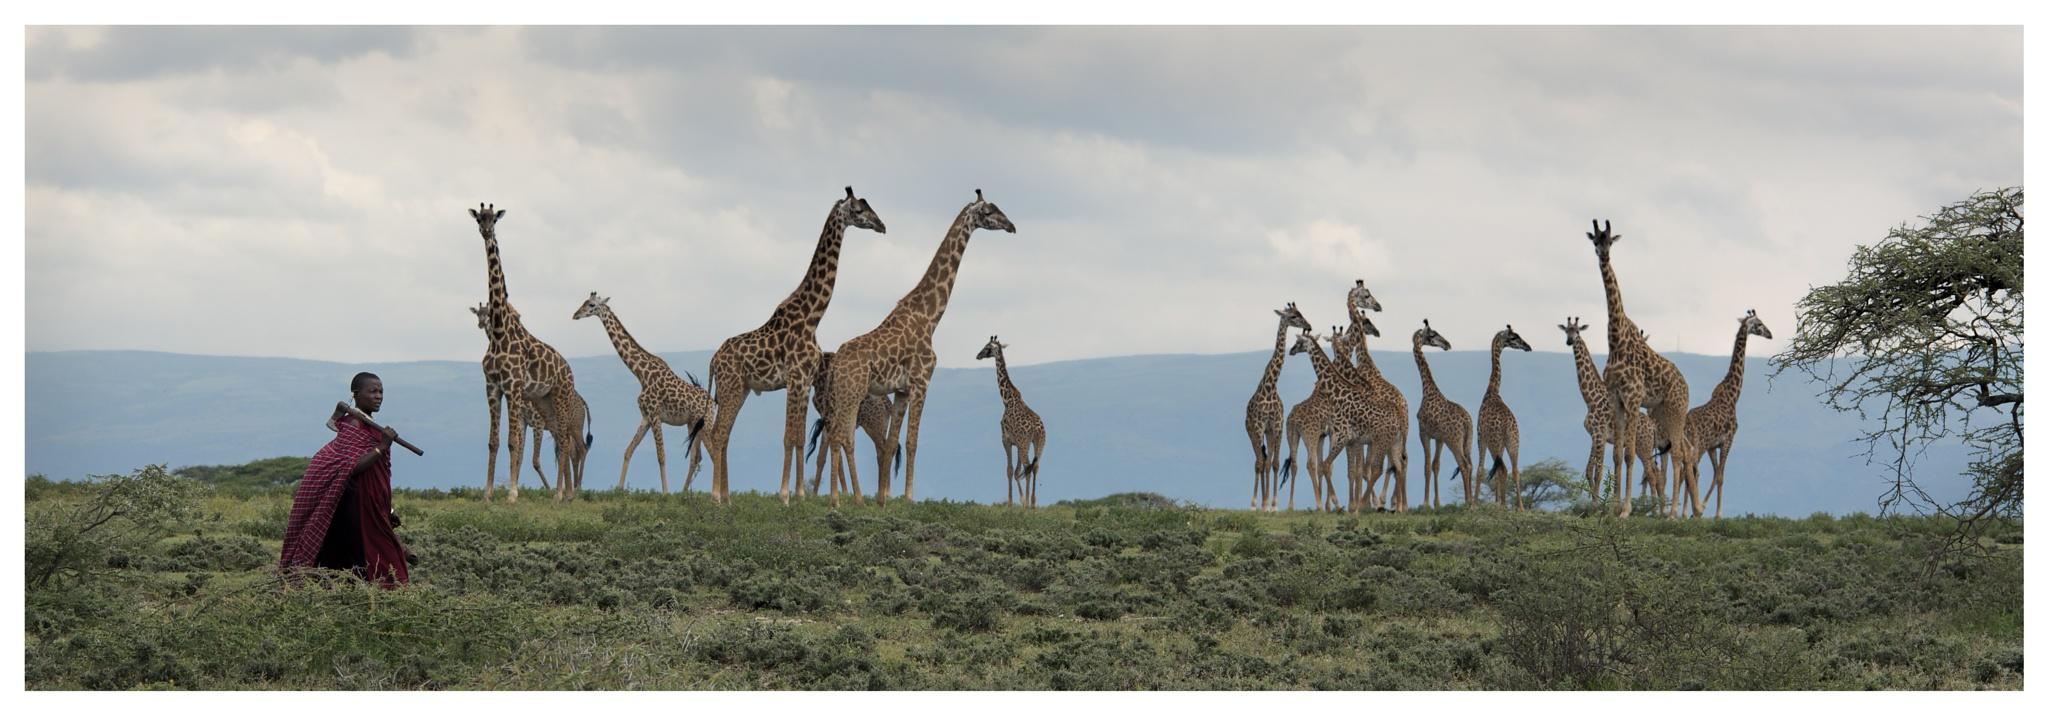 Masai woman and giraffes by Rafal Krzysiak